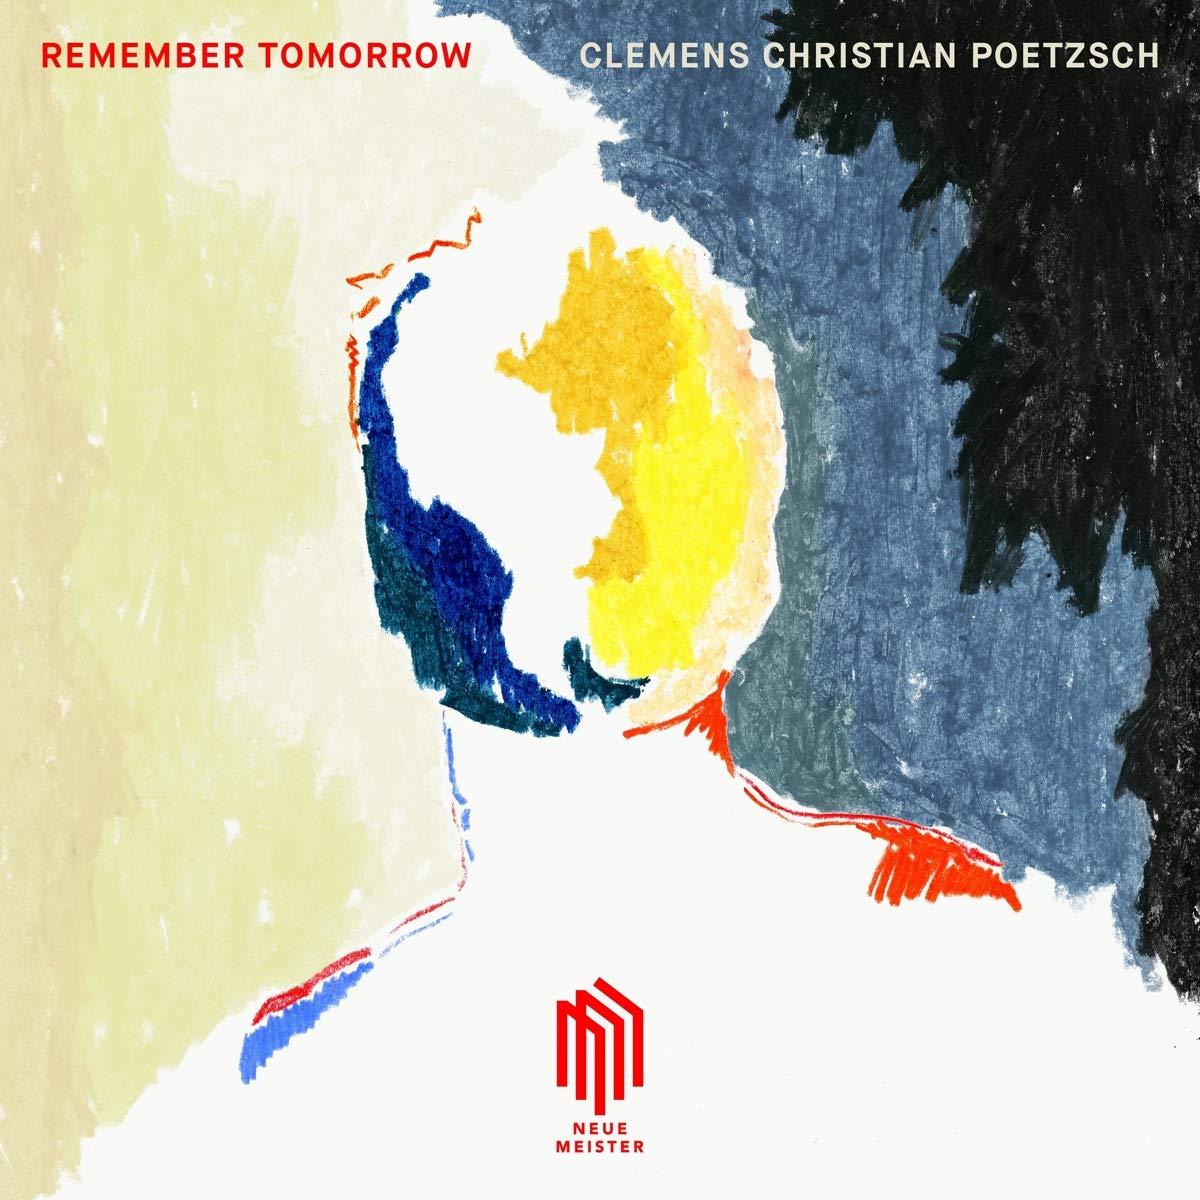 Vinilo : CLEMENS CHRISTIAN POETZSCH - Remember Tomorrow (LP Vinyl)